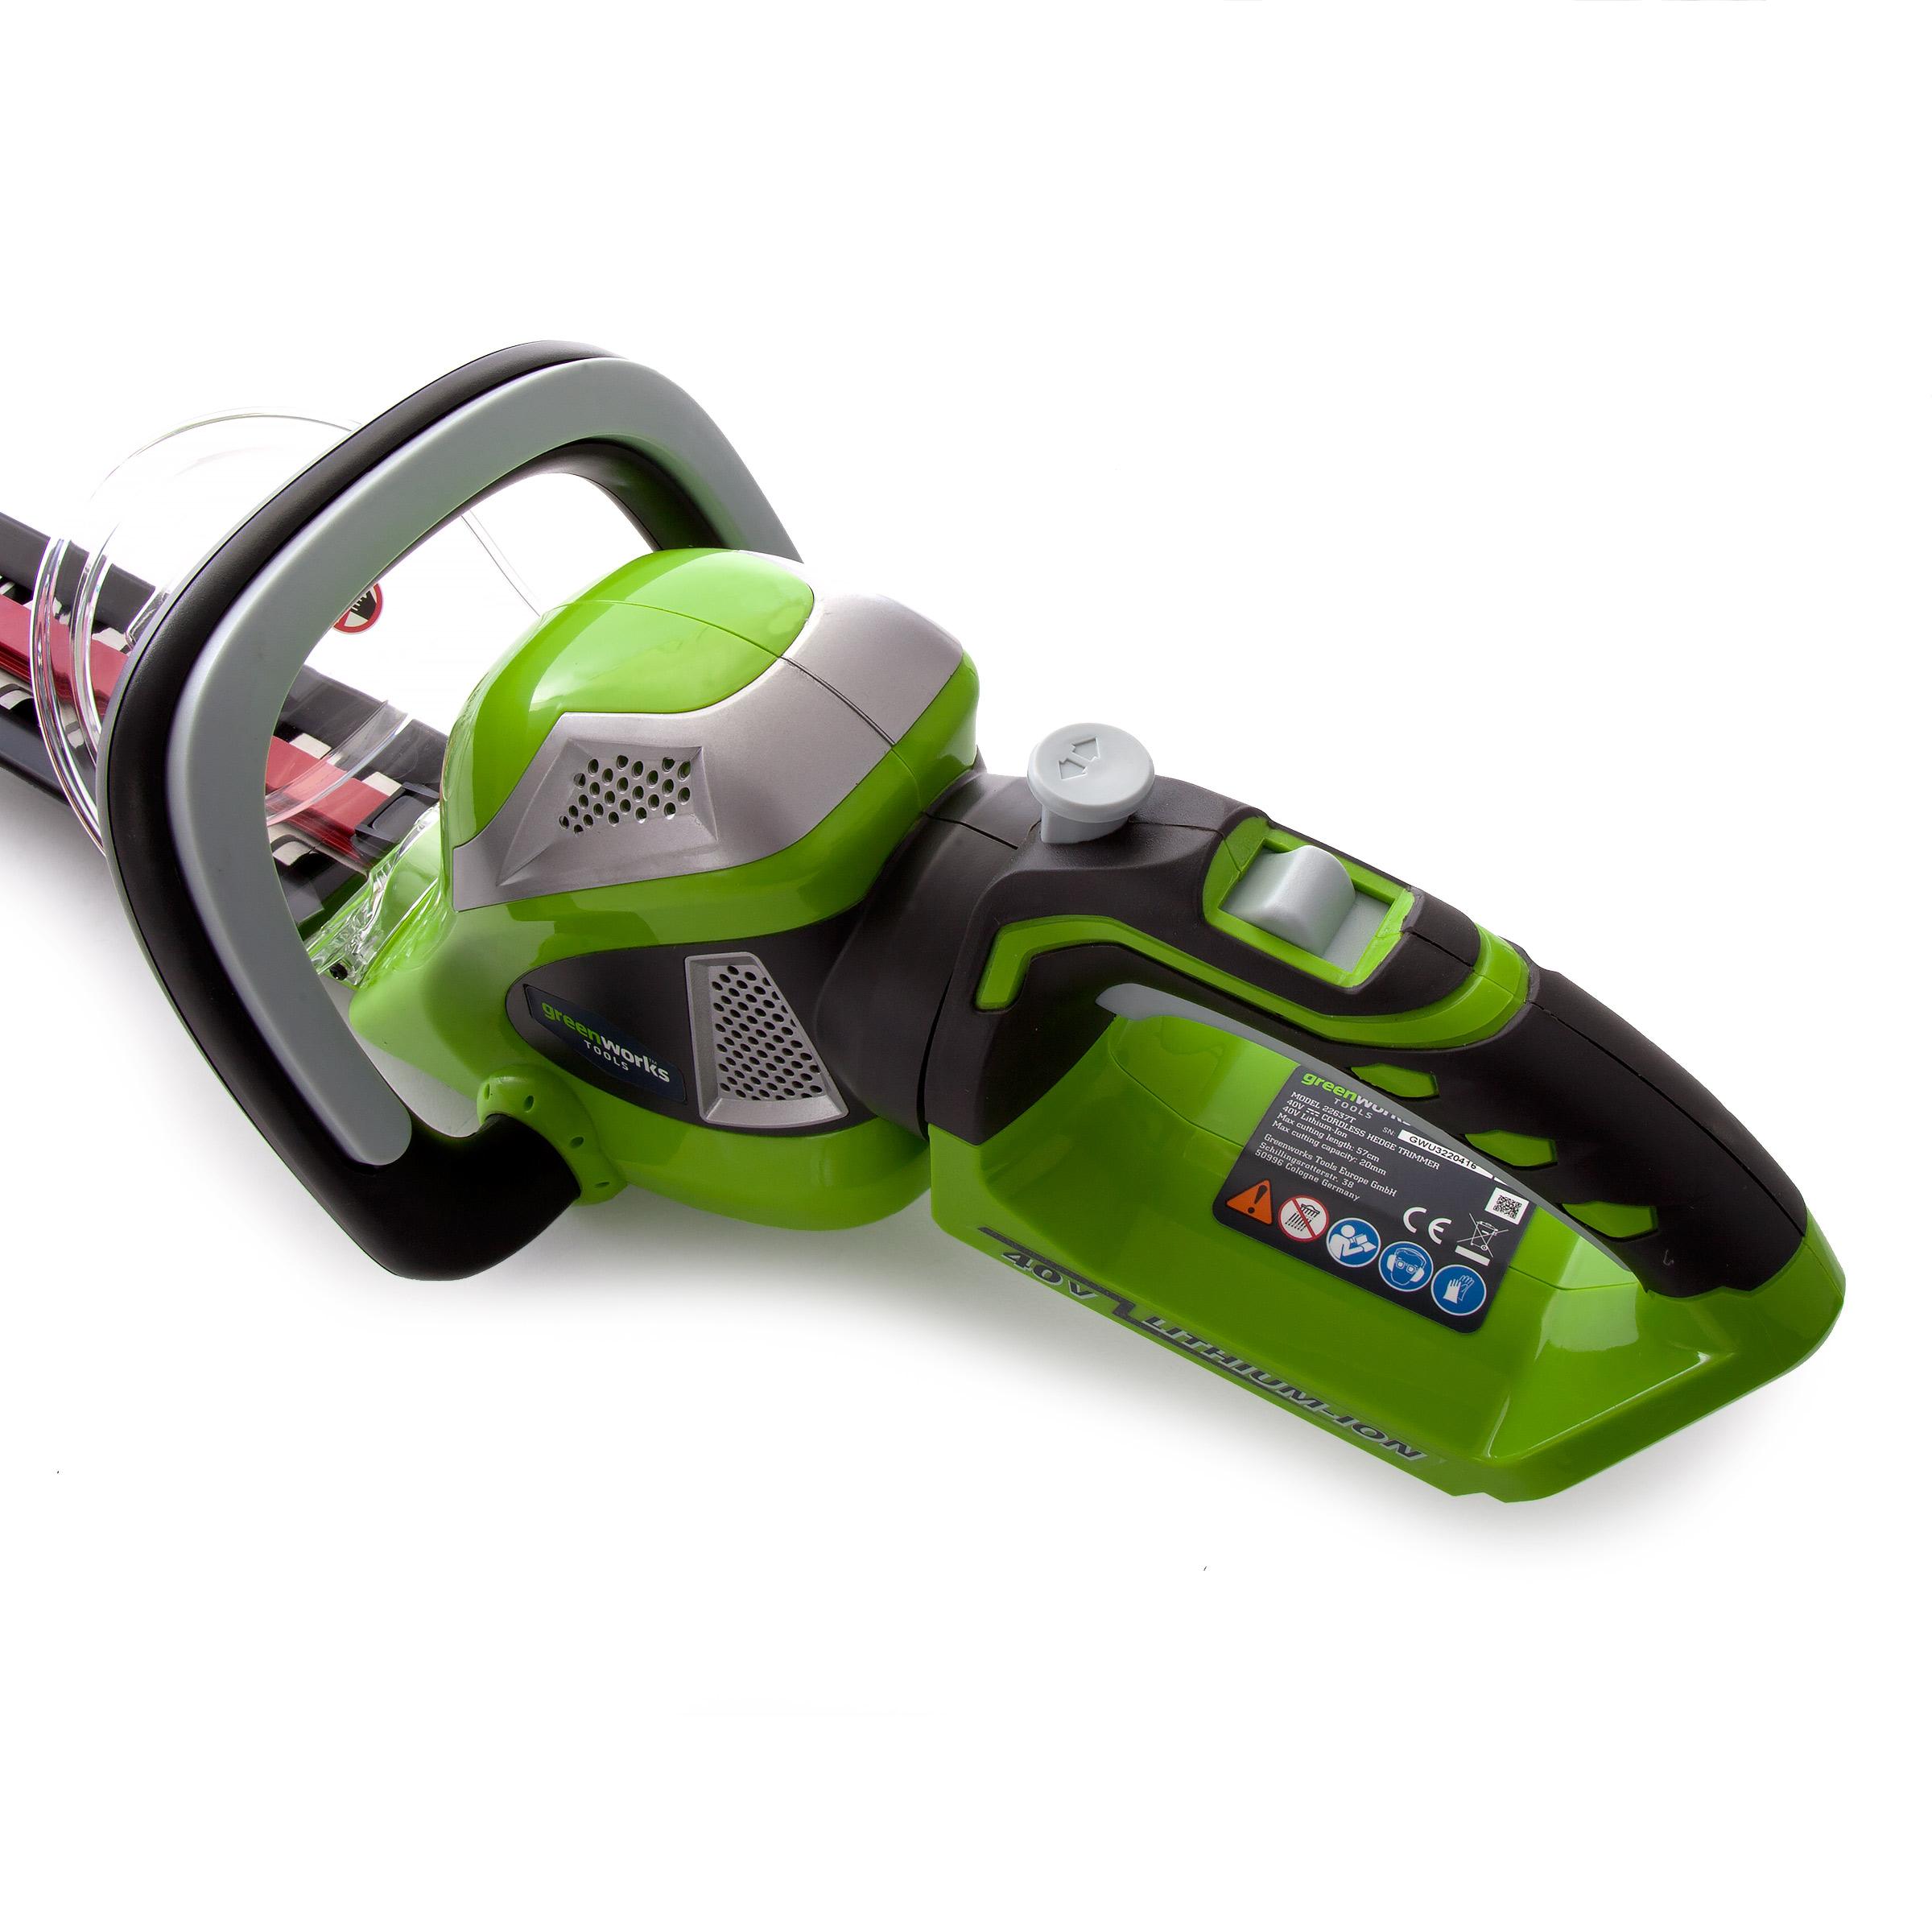 Greenworks G40HT61 40V Cordless Hedge Trimmer (Tool Only)